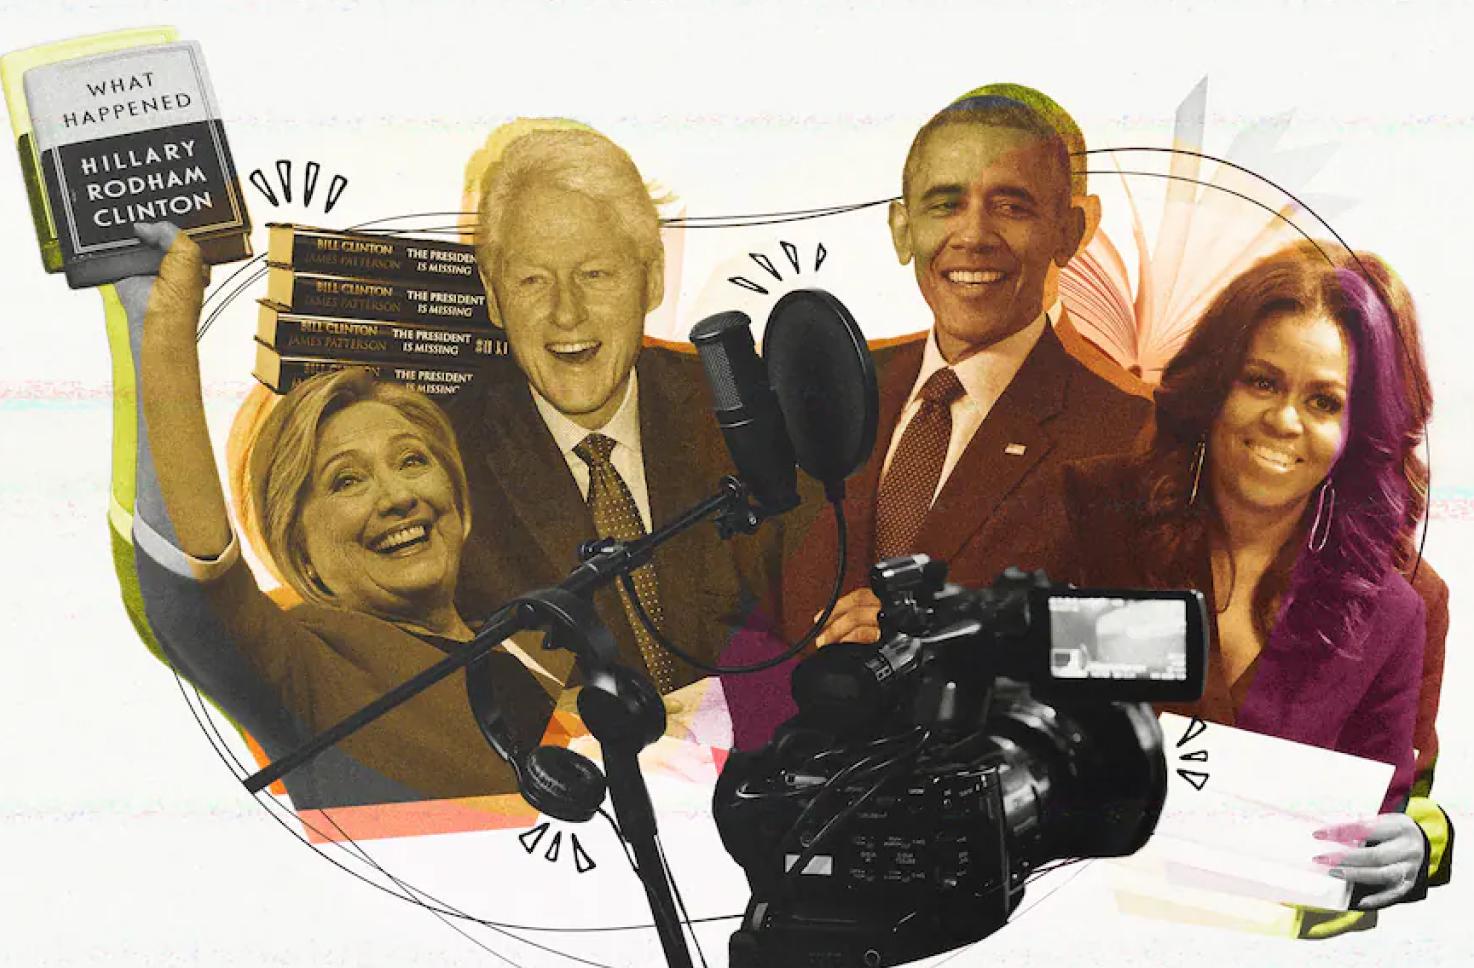 Image of Hillary Clinton, Bill Clinton, Barack Obama an Michelle Obama